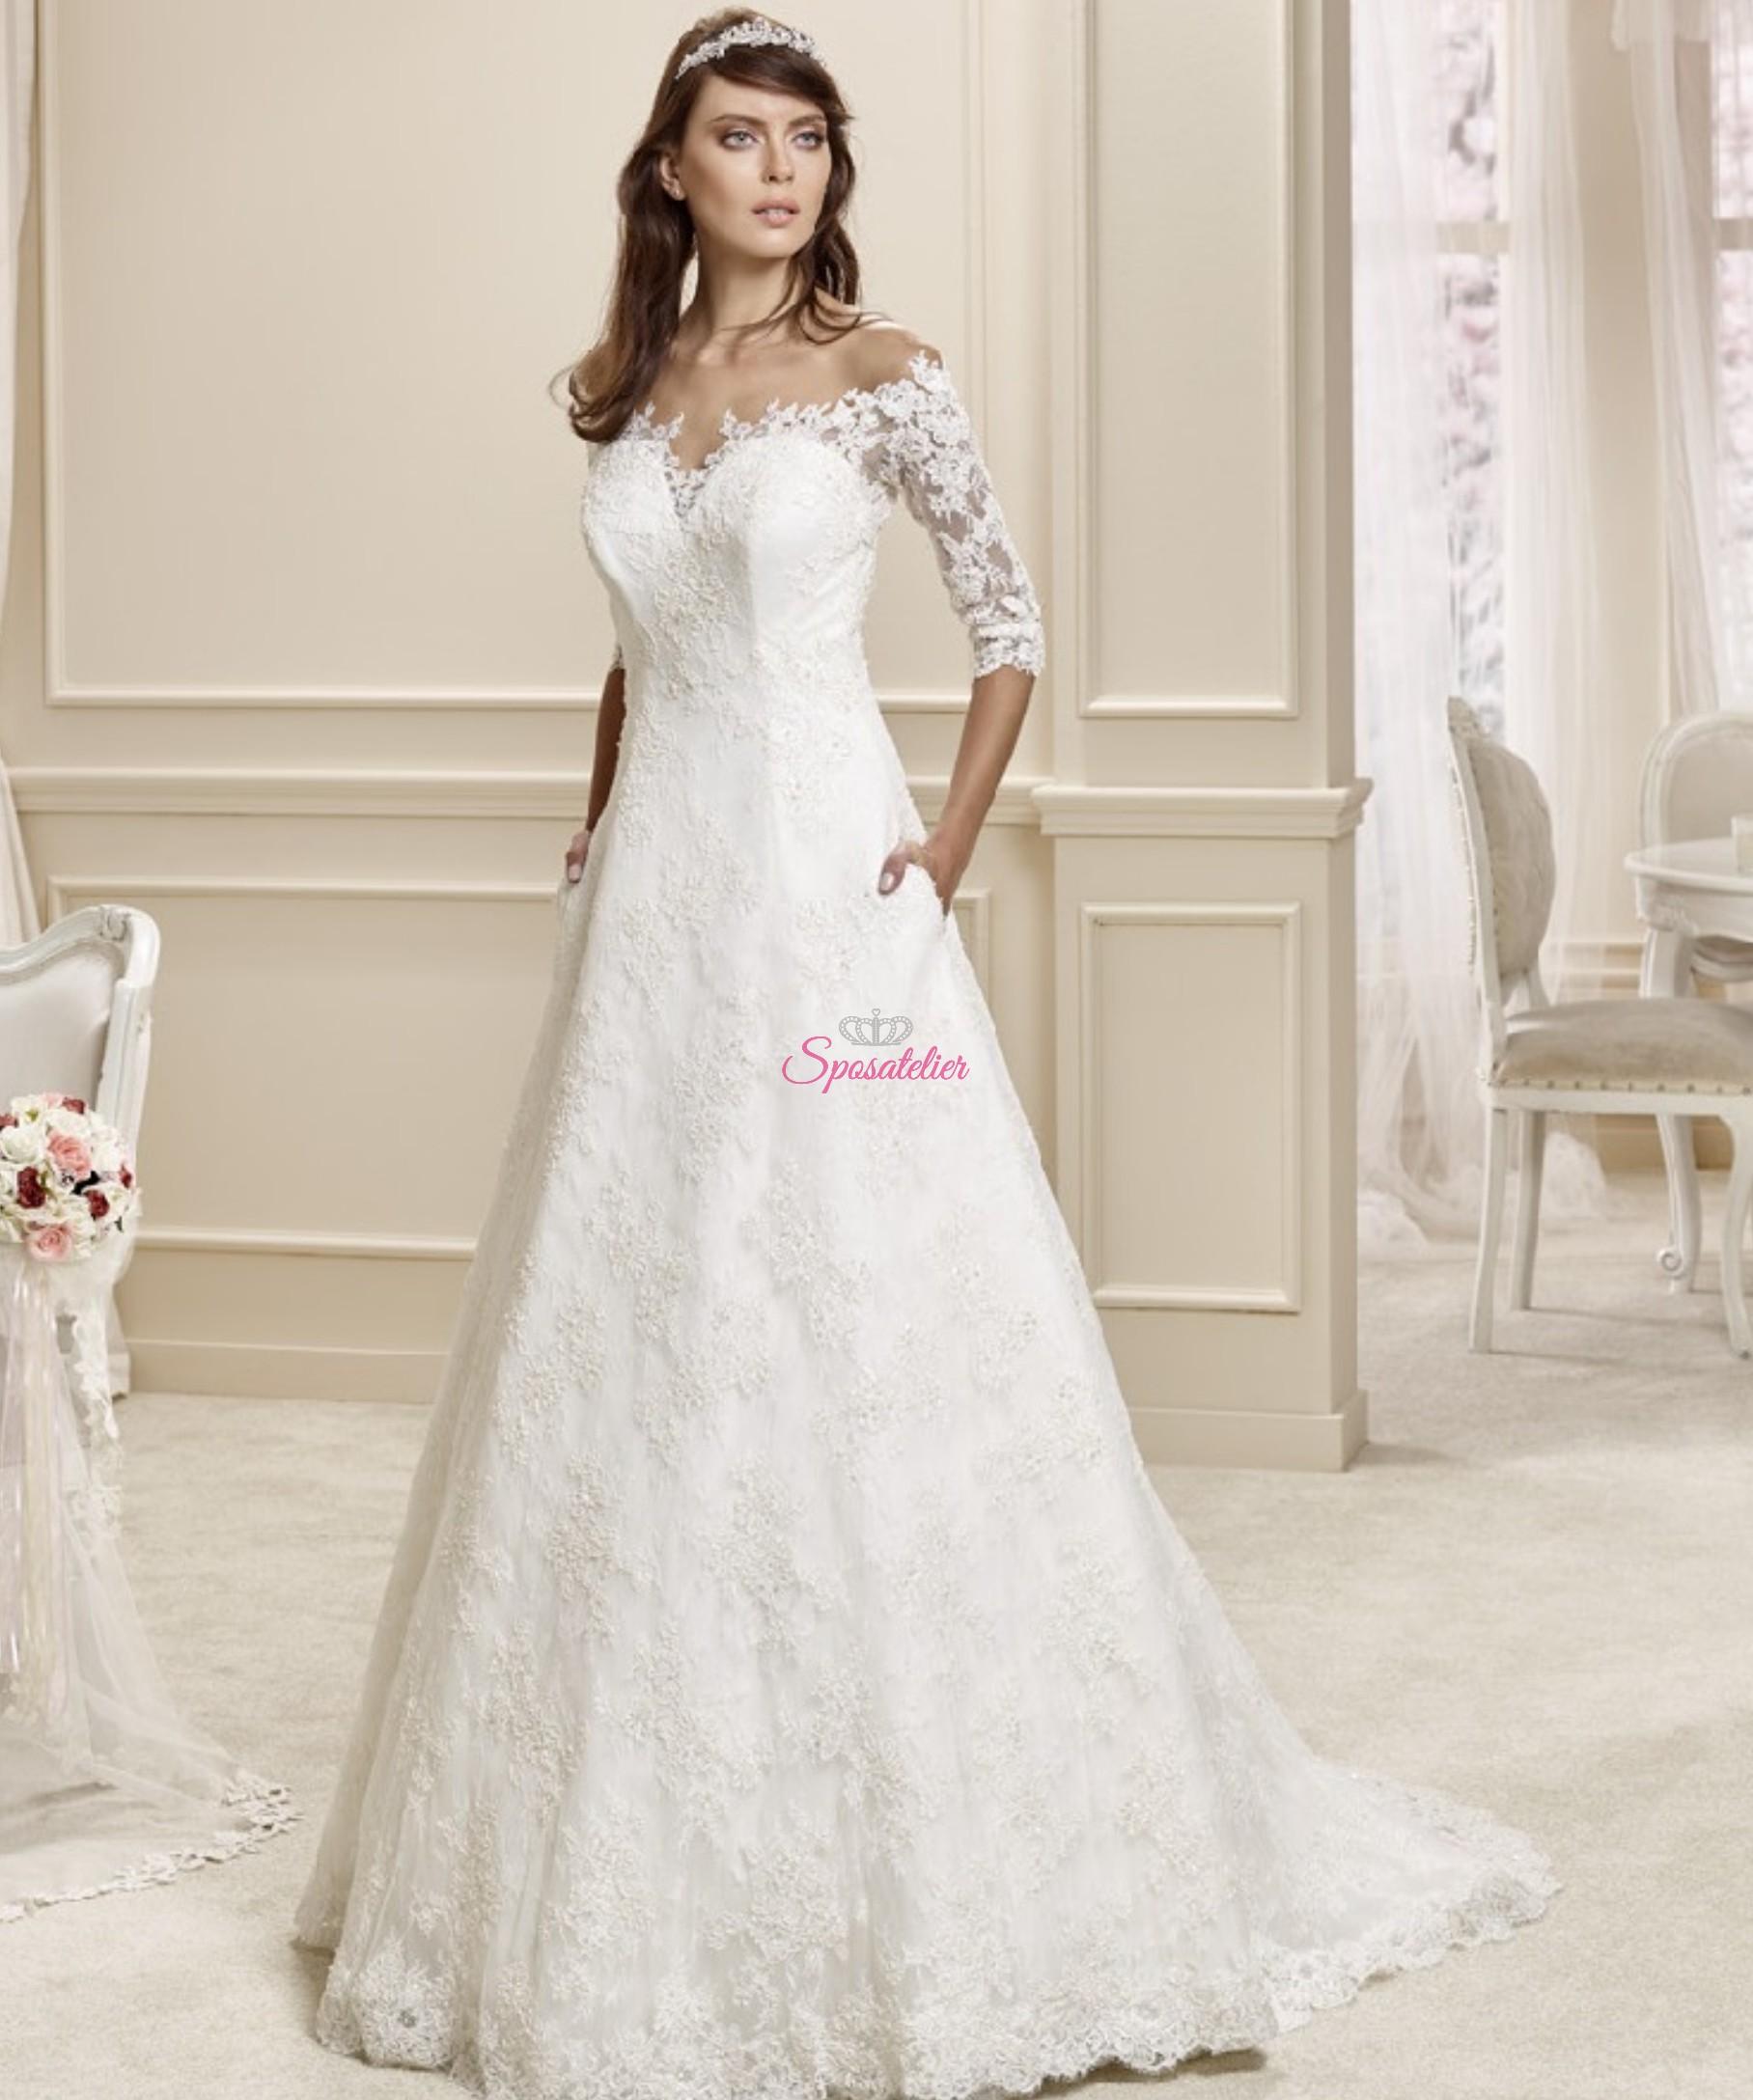 Talya-vendita abiti da sposa online Italia economici Sposatelier